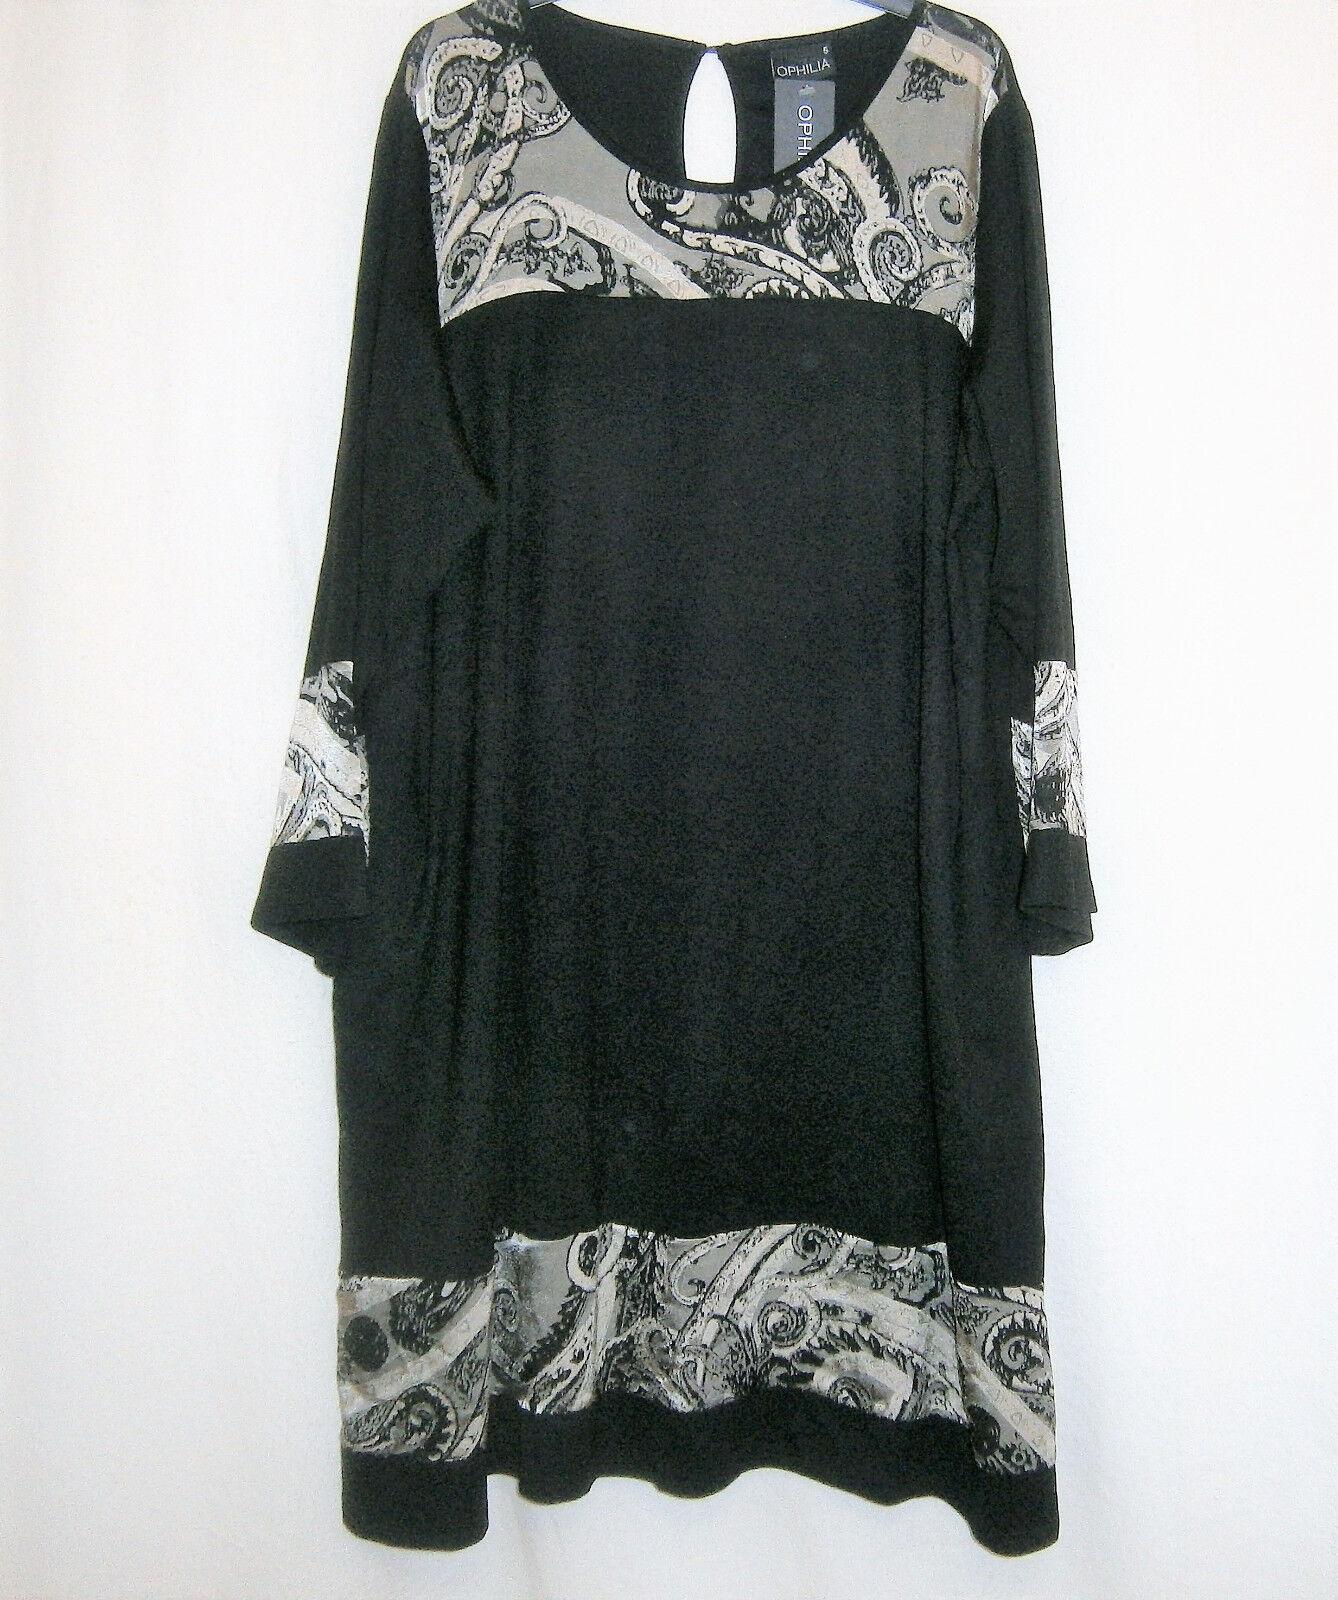 Ophilia  edles Tunika Kleid schwarz mit Ausbrenner Langarm  (48 50 52) %%%